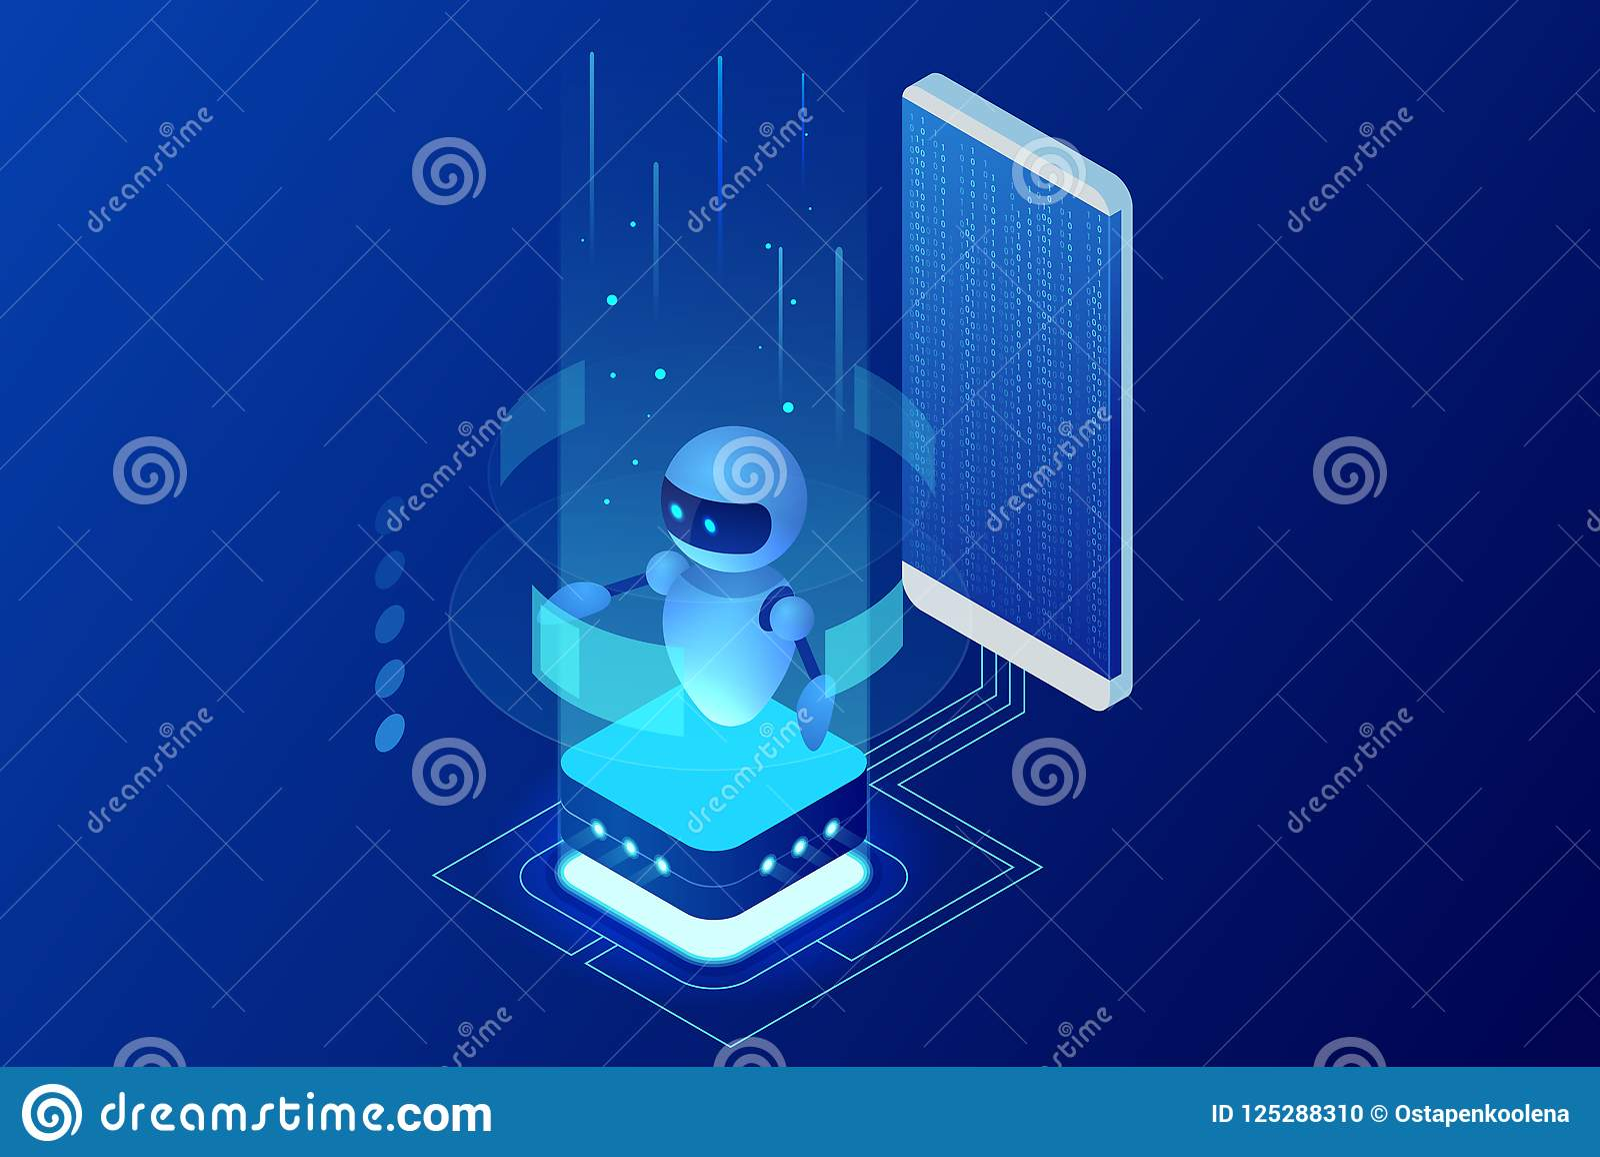 Isometric τεχνητή νοημοσύνη Chatbot και μελλοντικό μάρκετινγκ Έννοια AI και επιχειρήσεων IOT Υπηρεσία βοήθειας διαλόγου